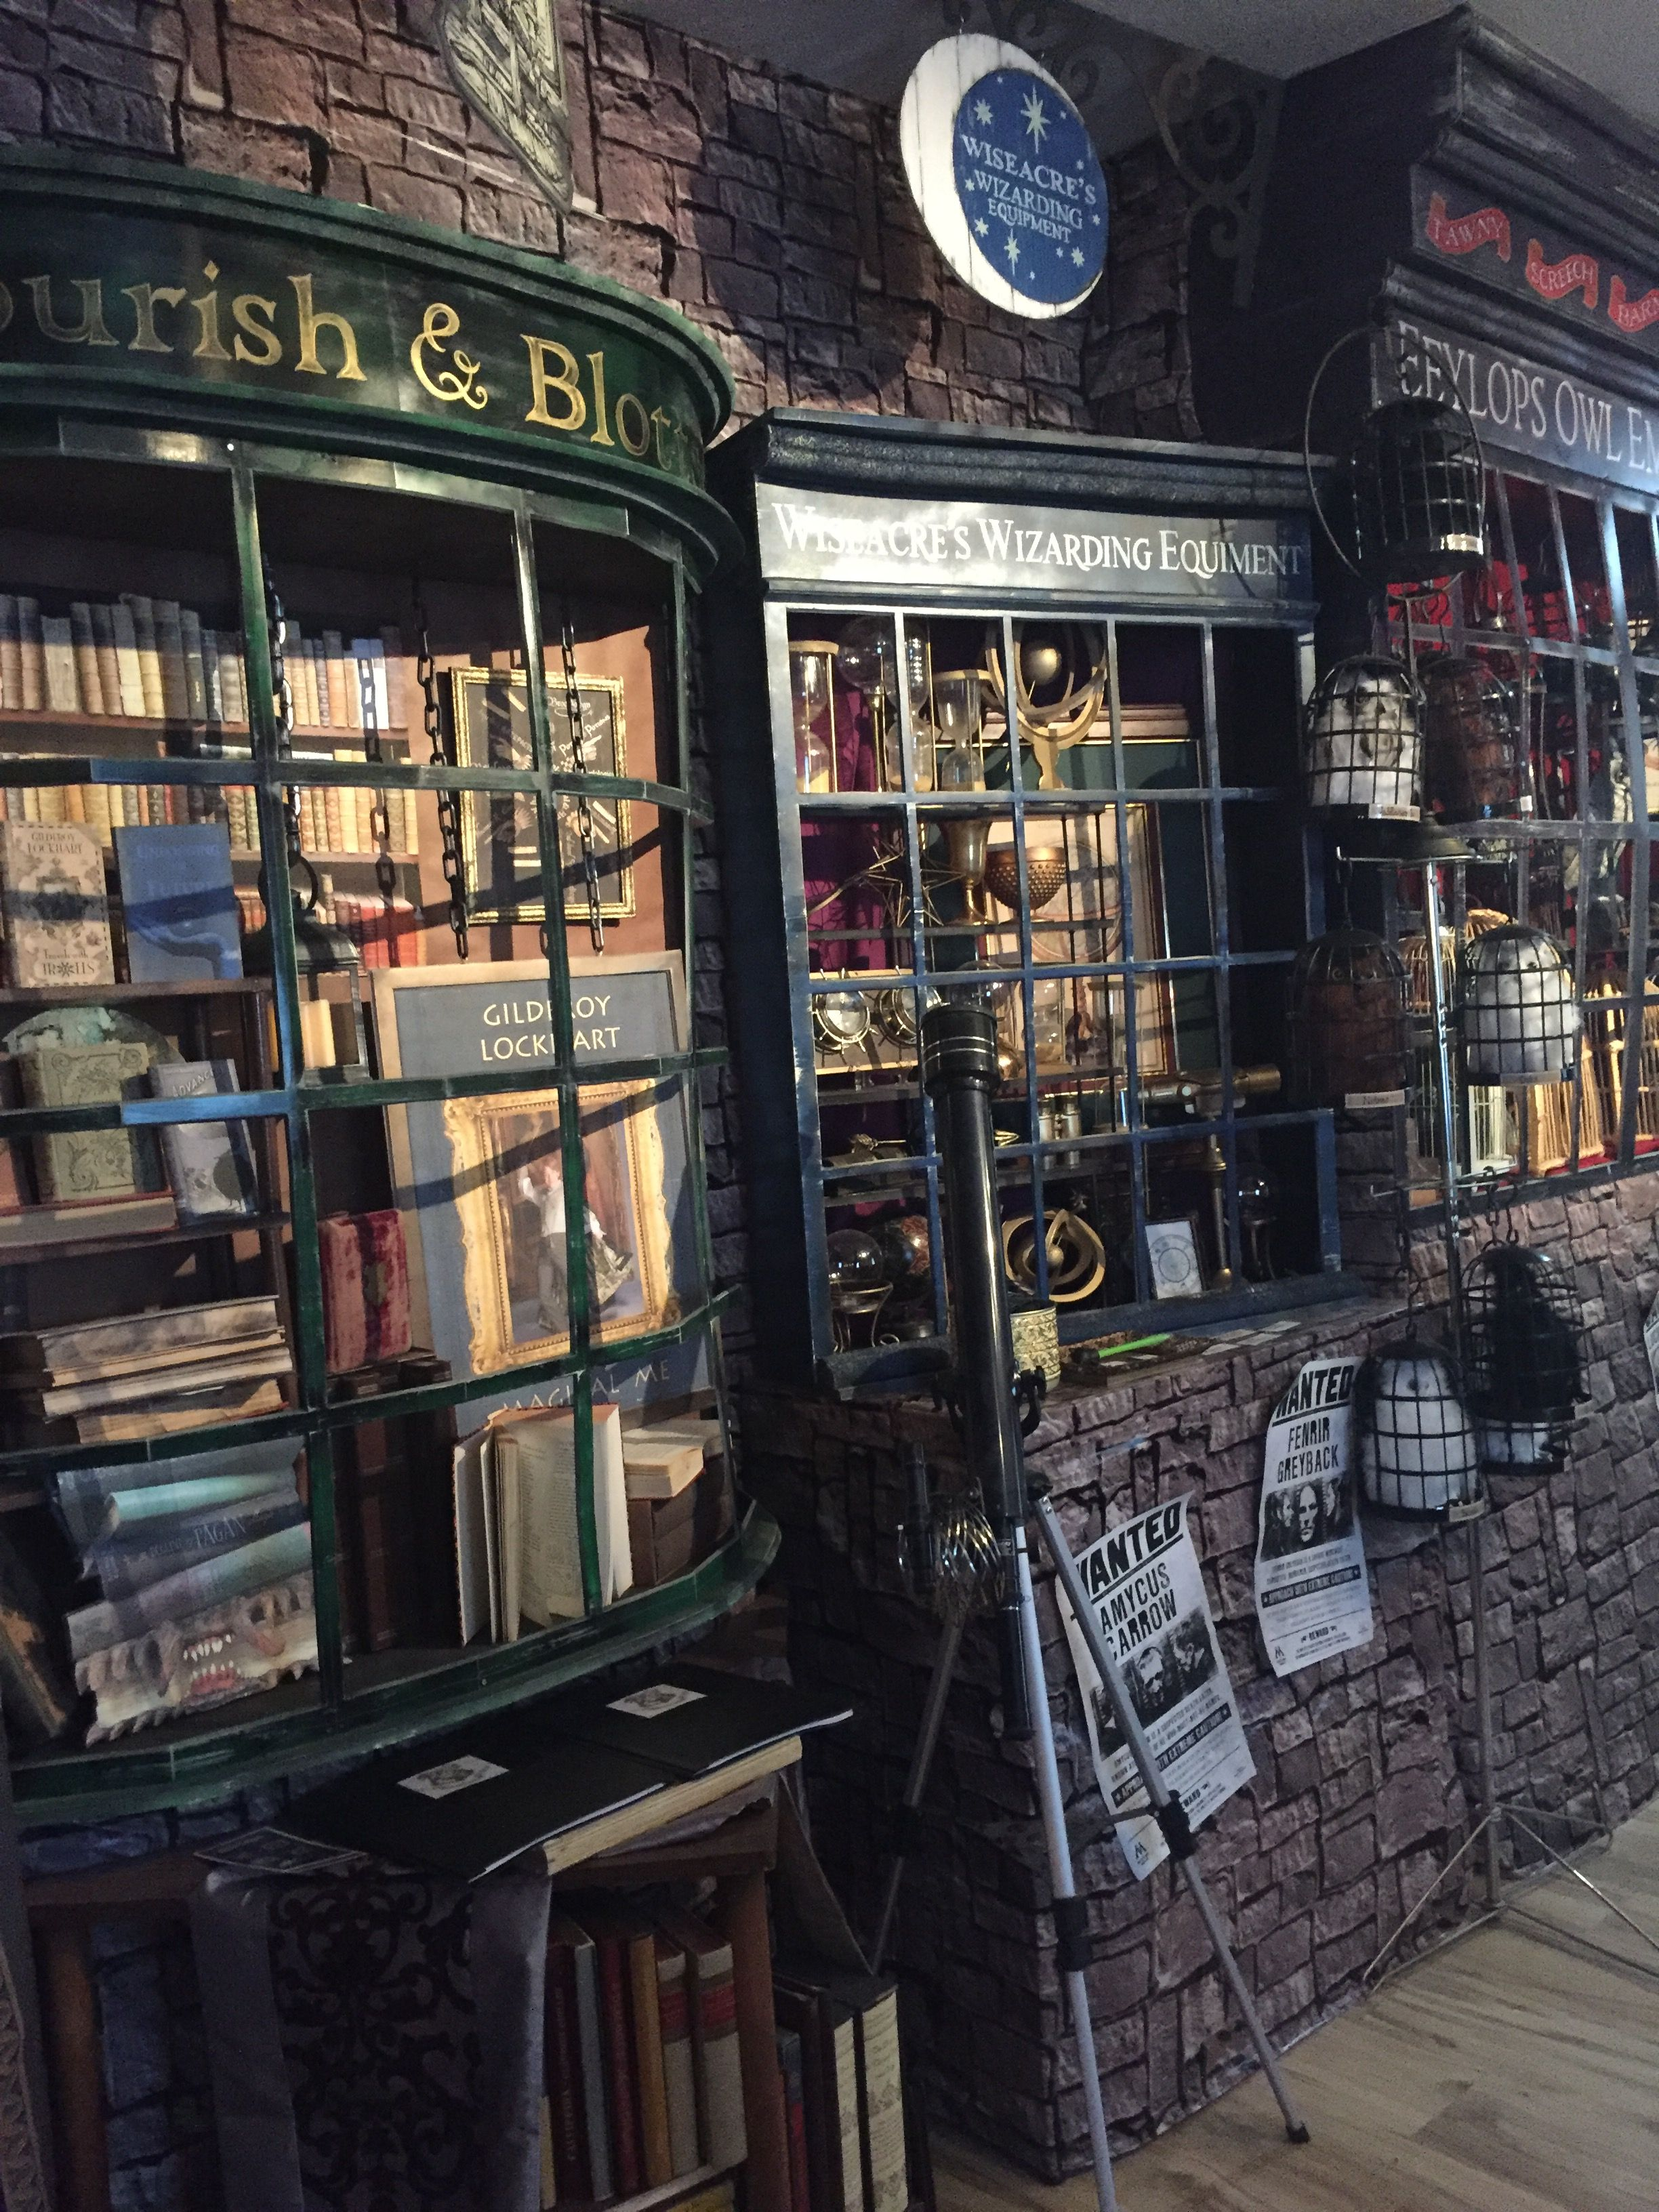 Harry Potter Diagon Alley Birthday Decor Magalie Sarnataro S Props Harry Potter Diagon Alley Harry Potter Shop Harry Potter Miniatures